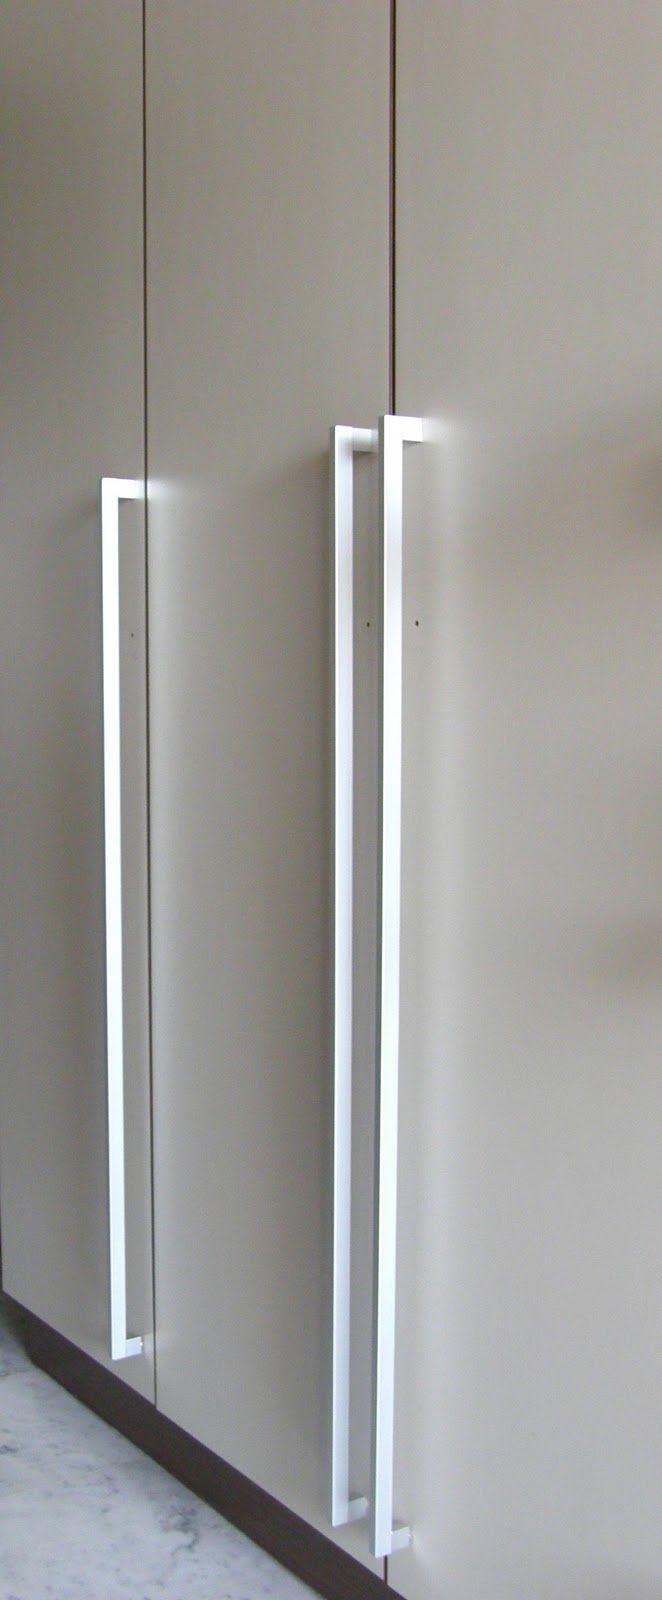 25 Best Ideas About Refrigerator Dimensions On Pinterest Kitchen Island Dimensions Kitchen